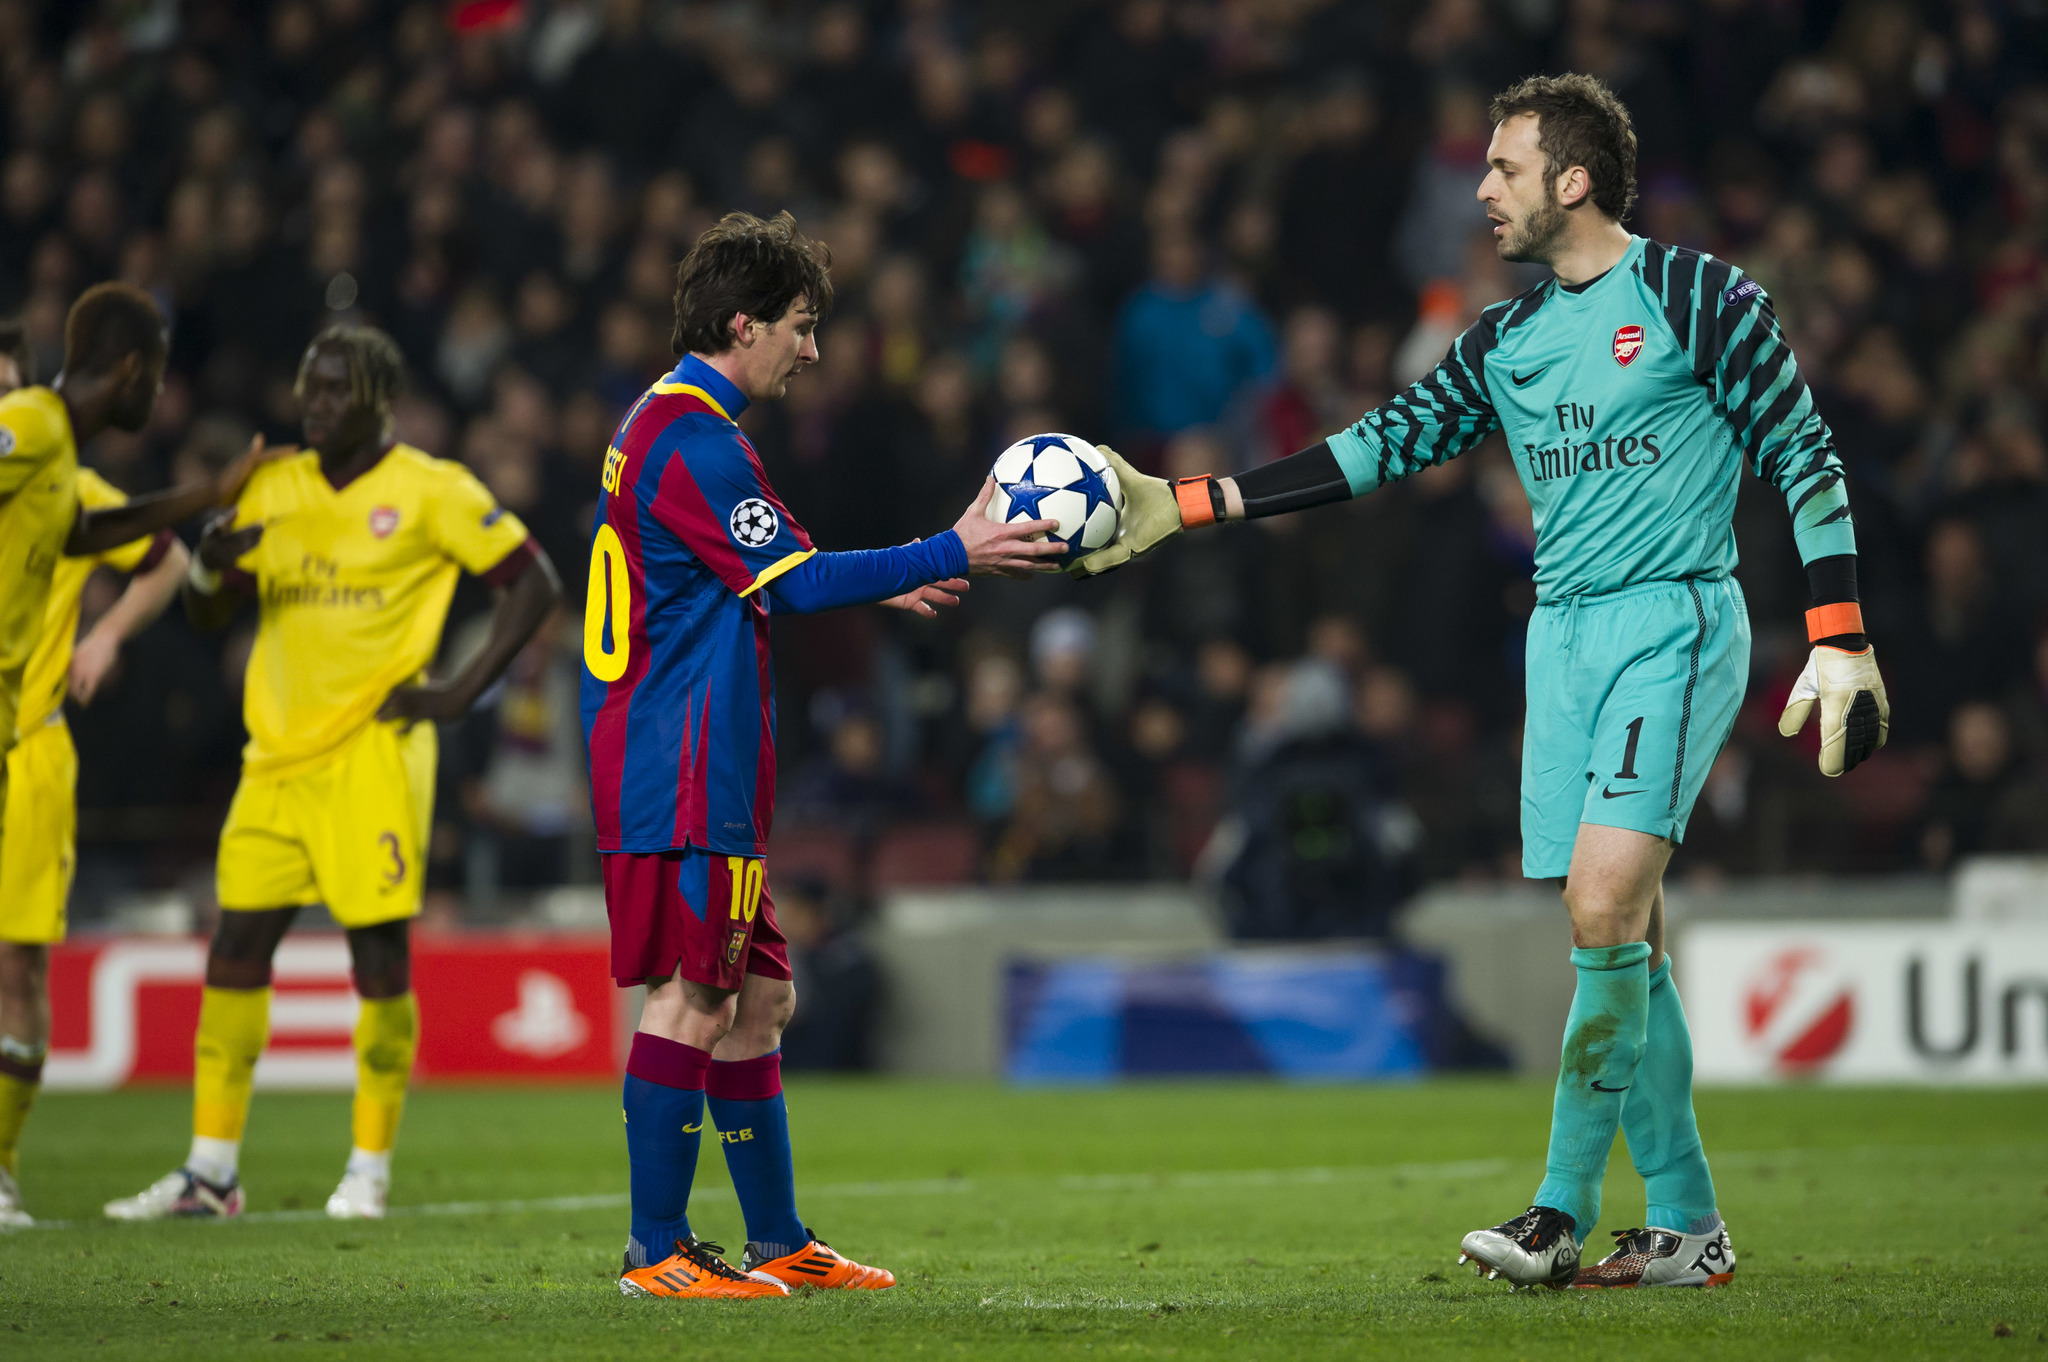 UEFA CHAMPIONS LEAGUE. LIGA DE CAMPEONES. OCTAVOS DE FINAL. PARTIDO DE VUELTA. PENALTI A FAVOR DEL FC BARCELONA. MESSI